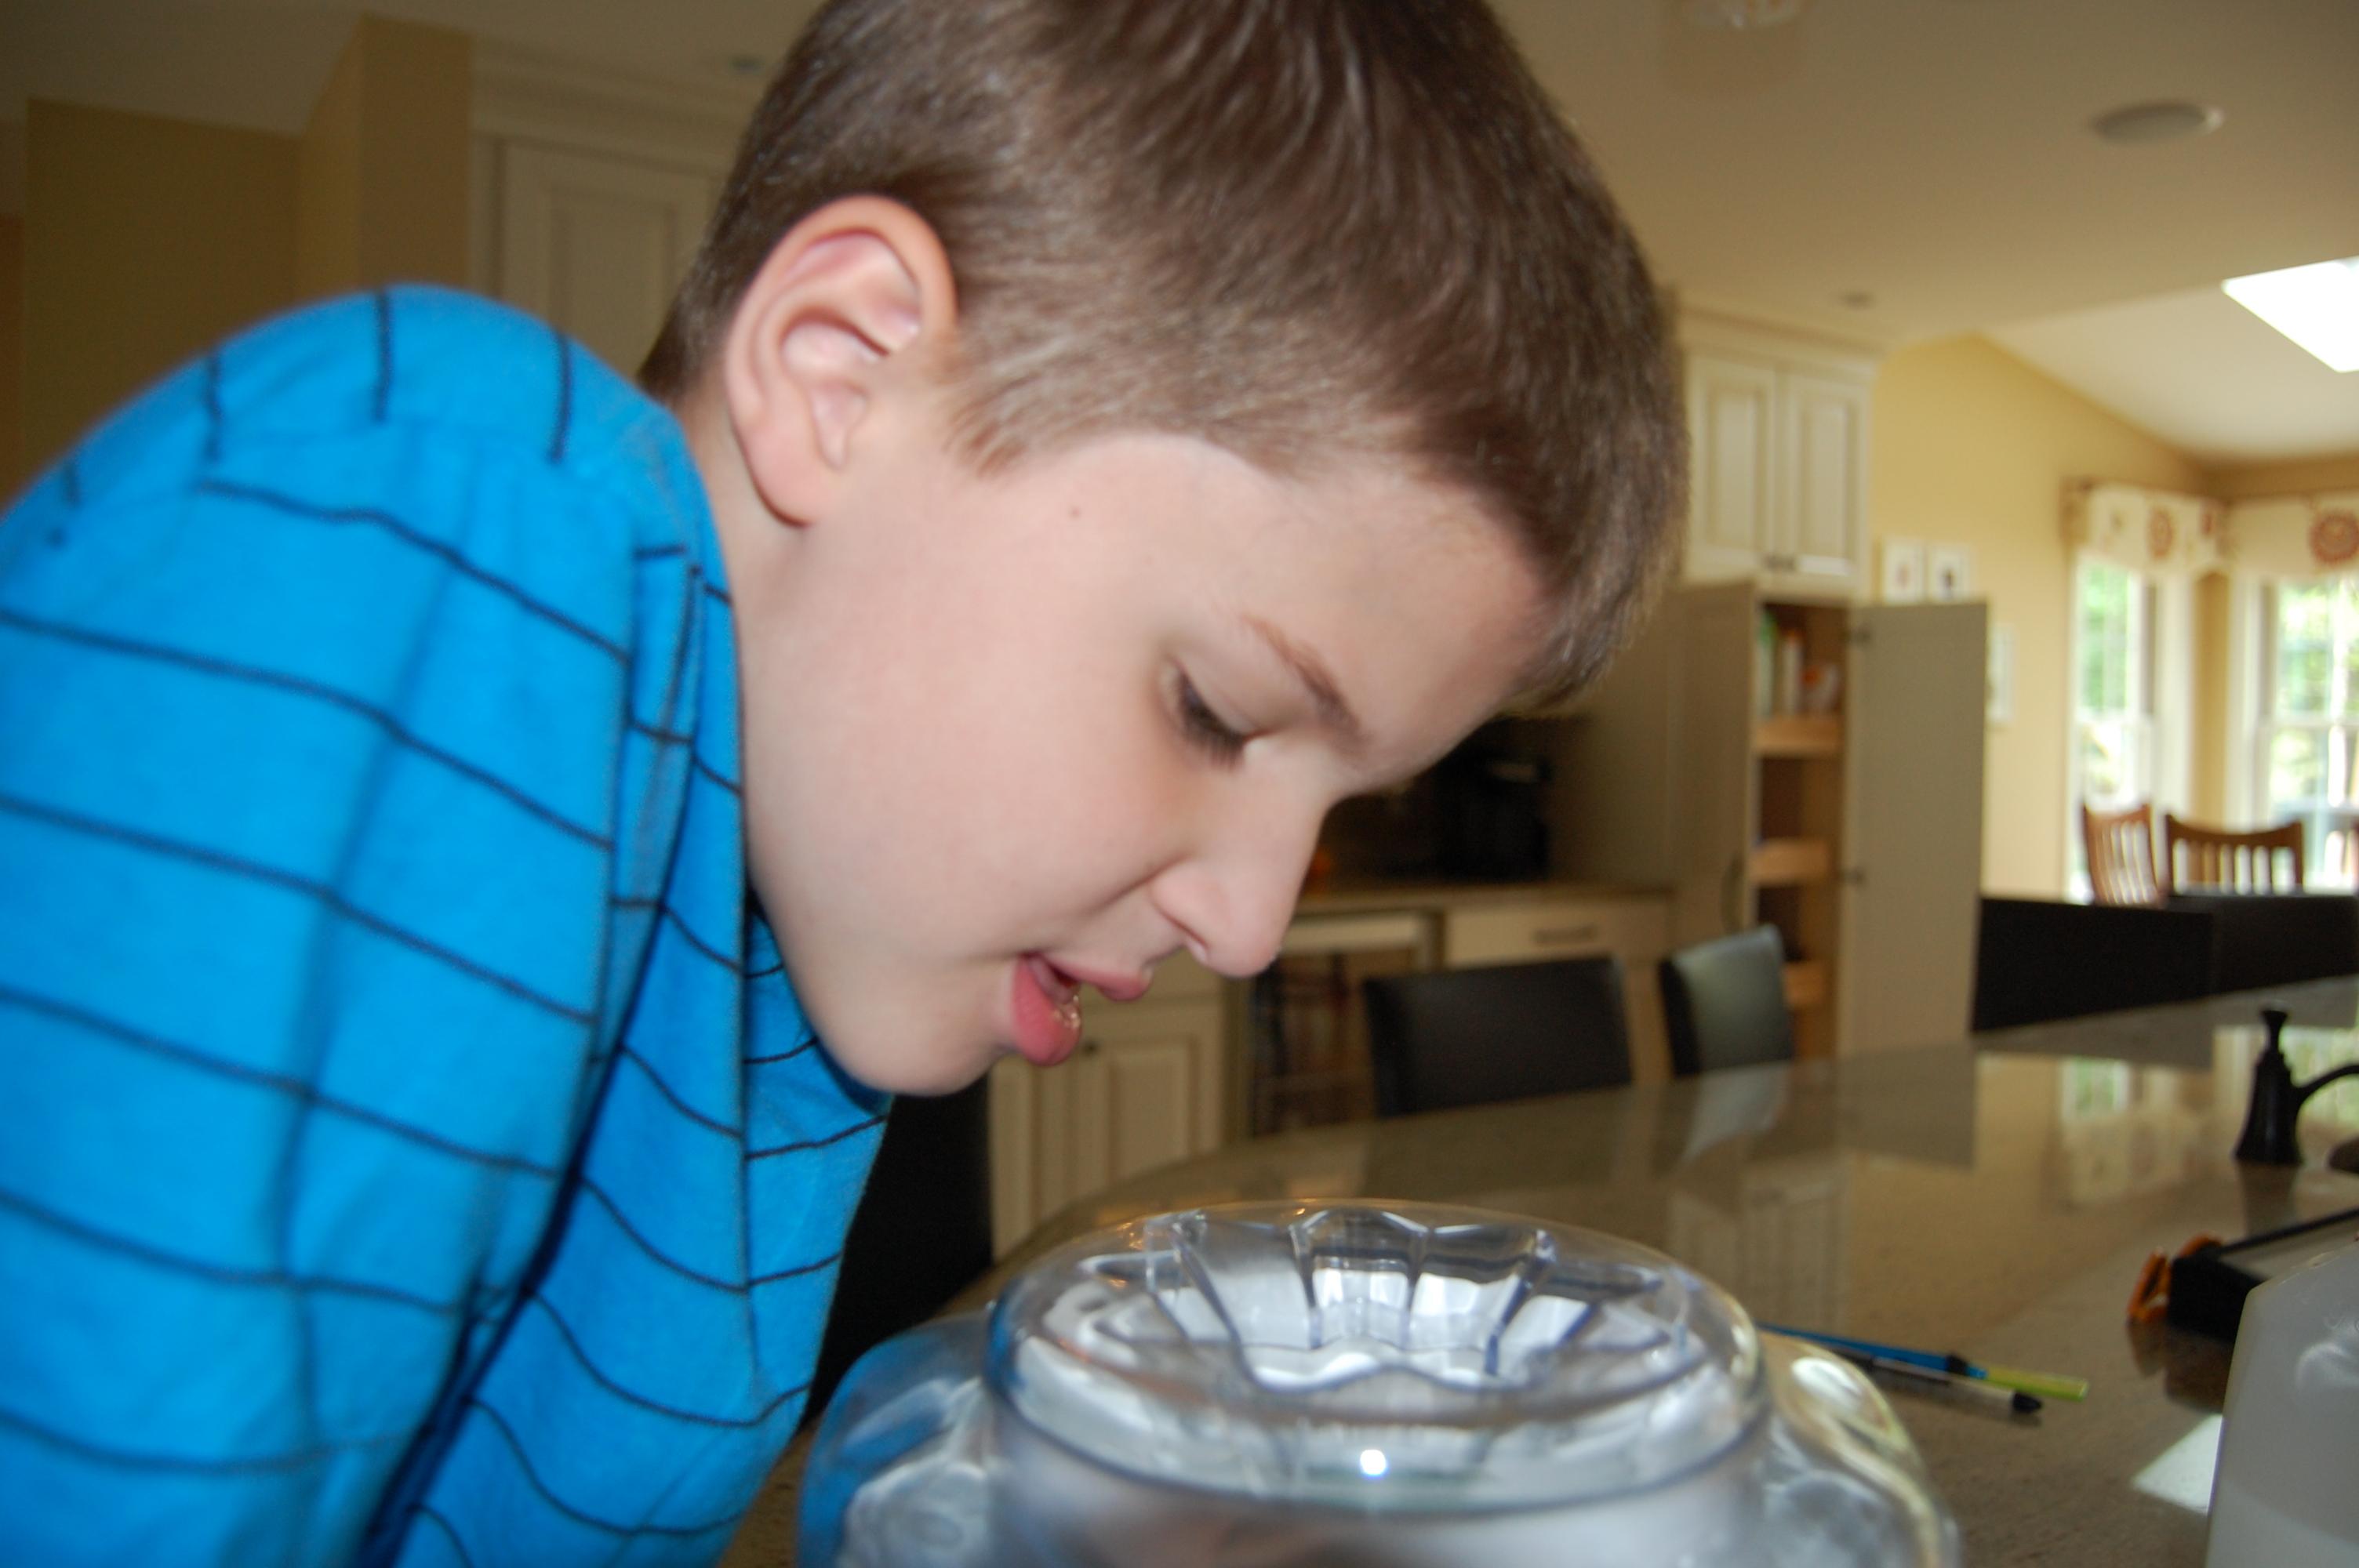 Jack helping make his favorite ice cream.